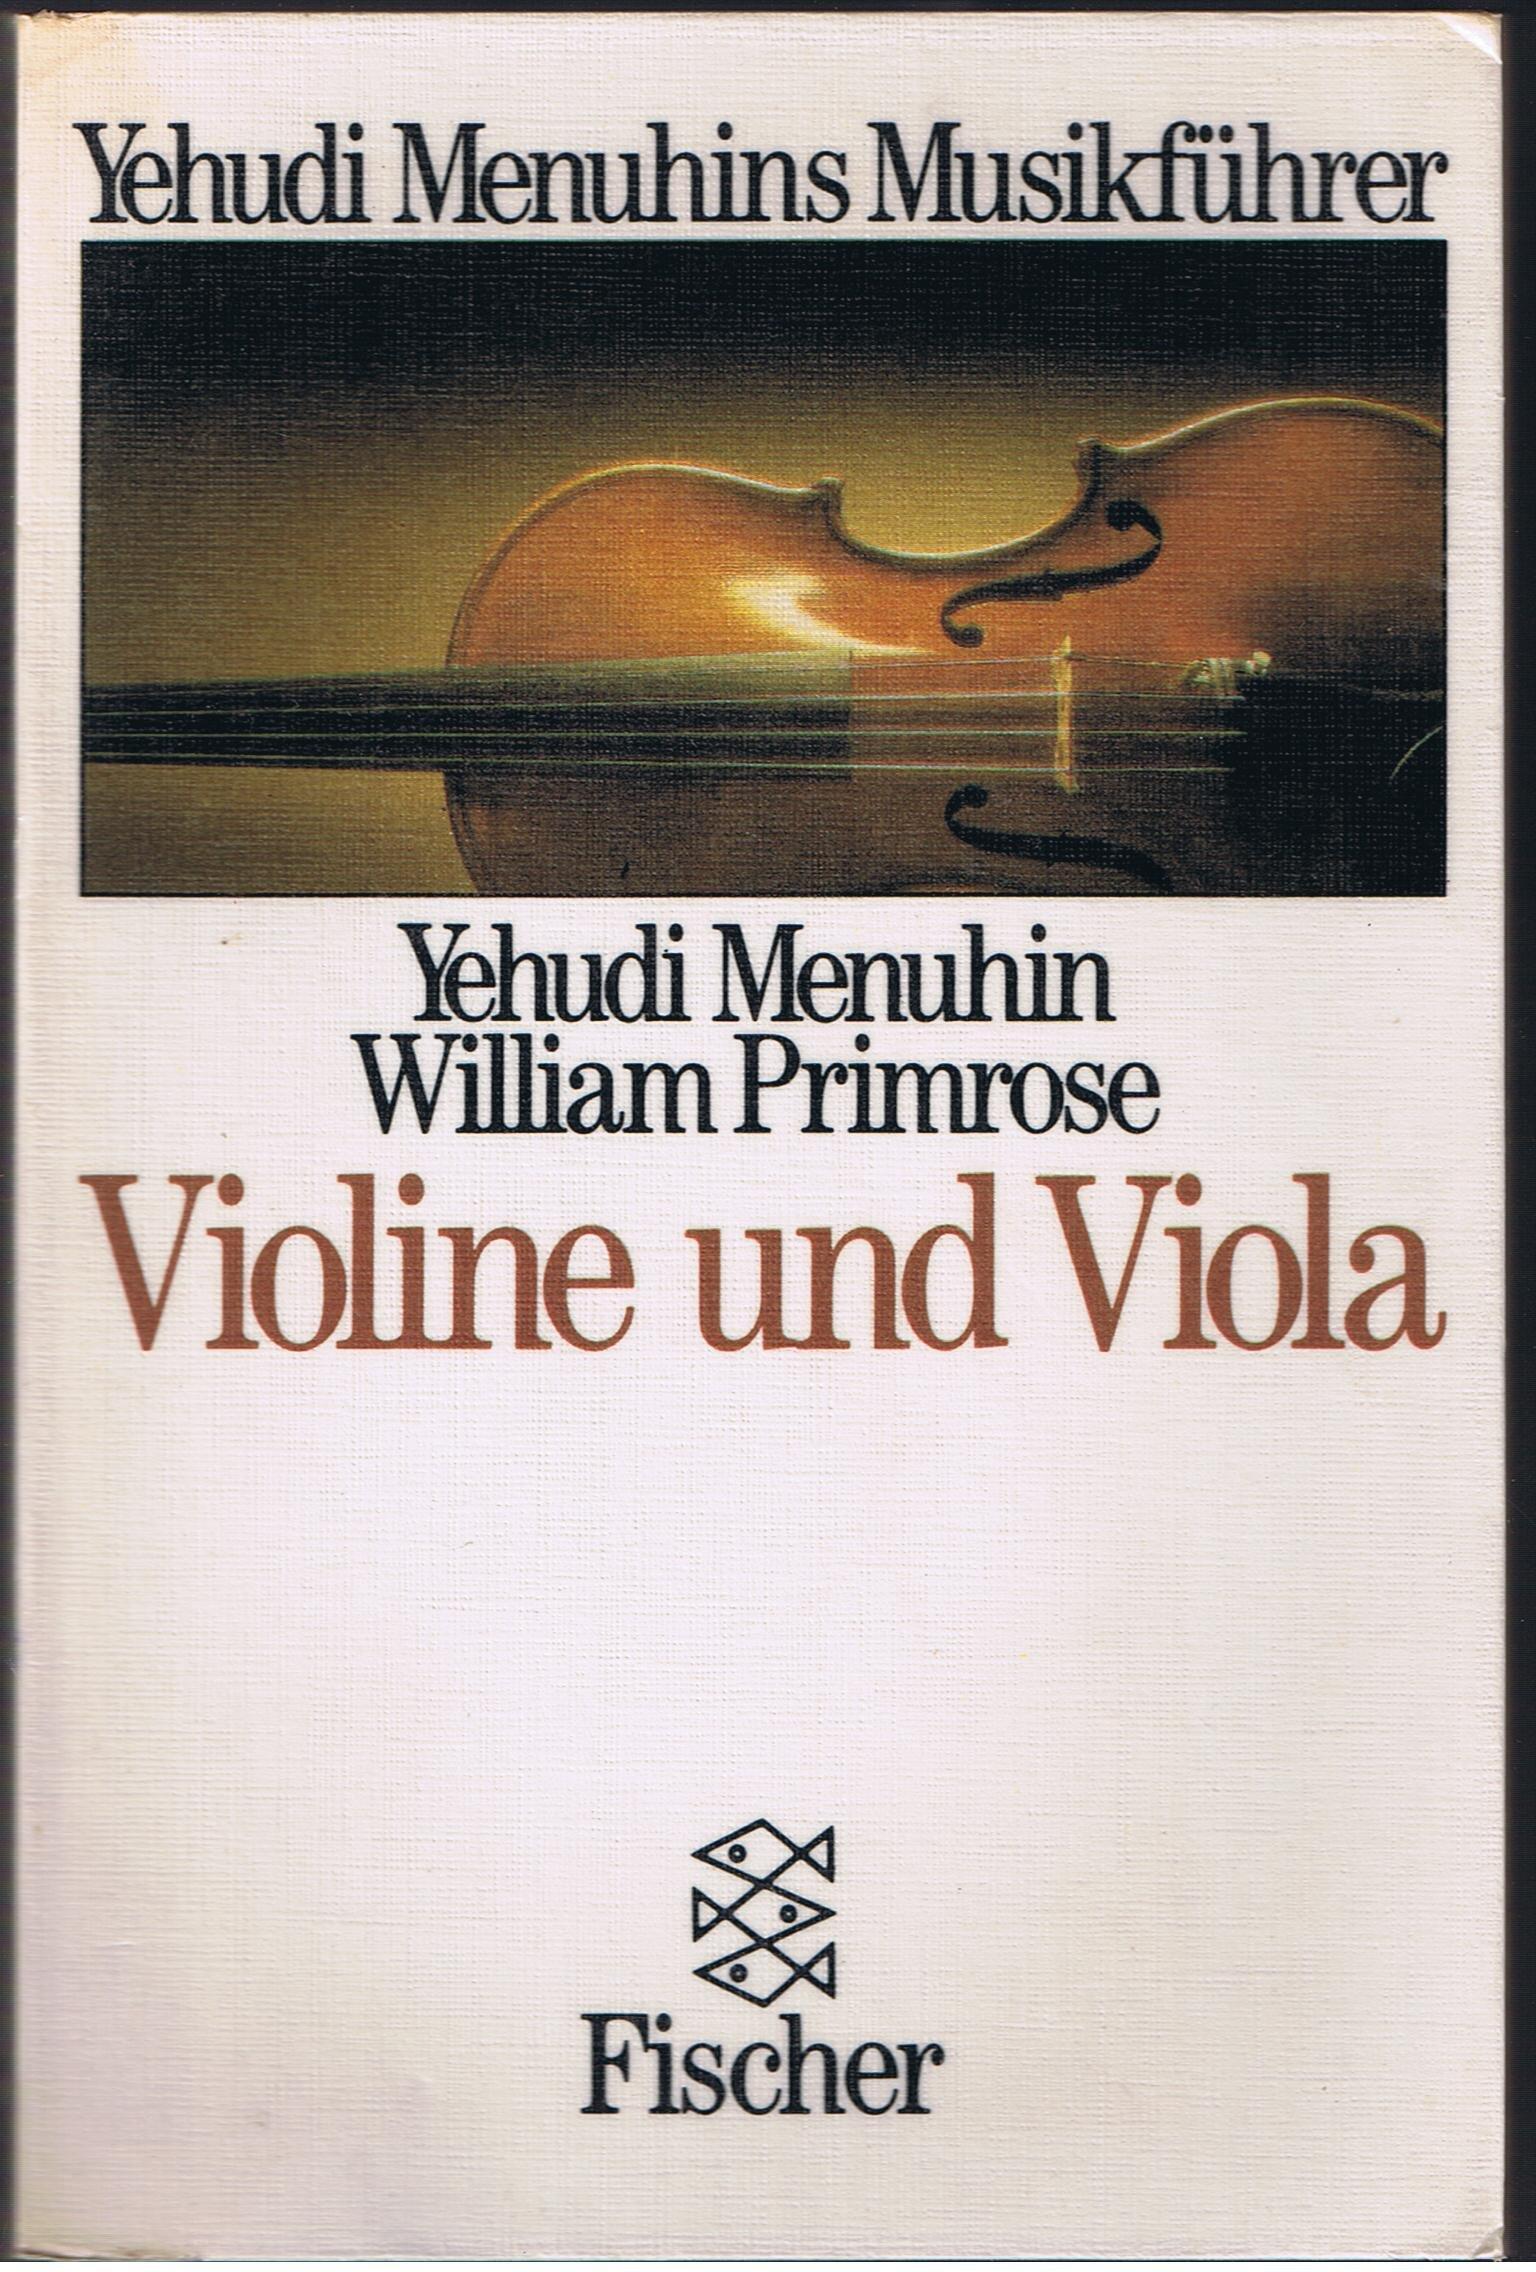 Violine und Viola: Yehudi Menuhins Musikführer